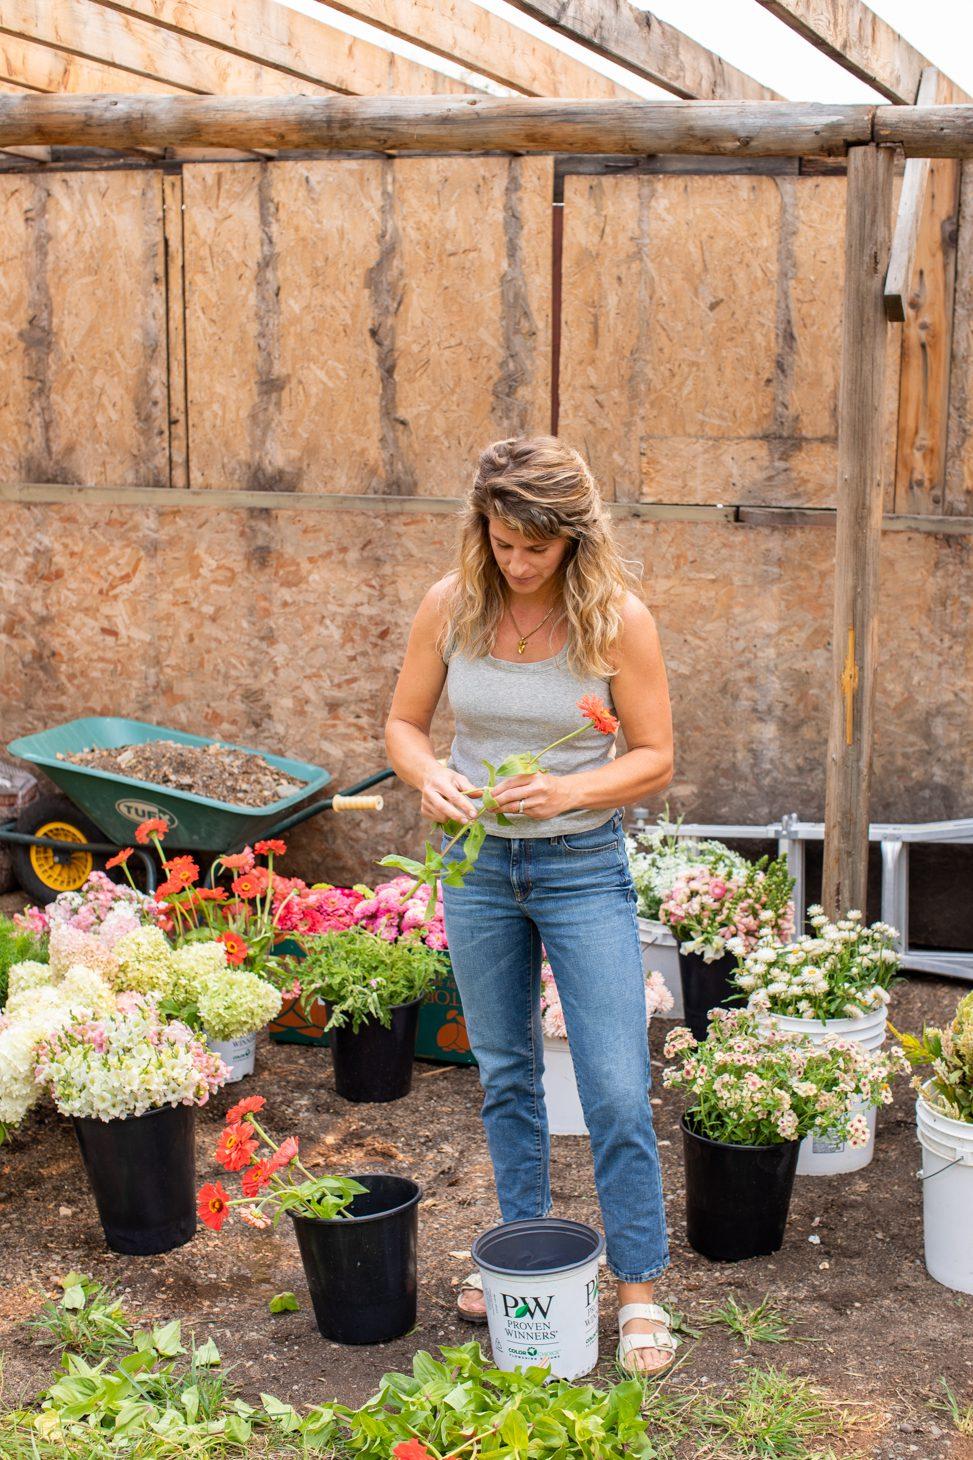 Yolanda From Farm and Flower Co